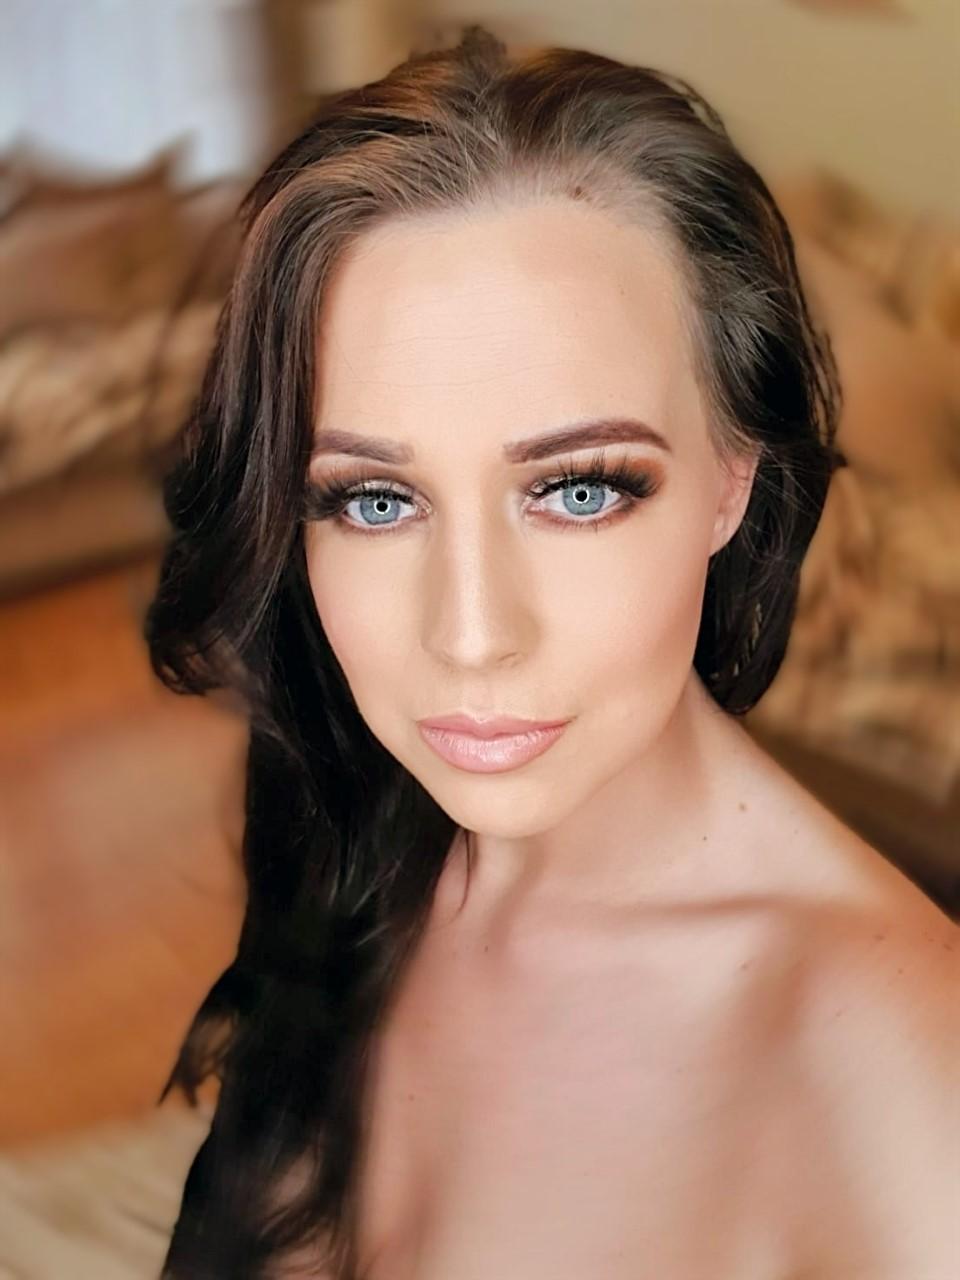 wowzer cosmetics training academy training school beauty courses online learning